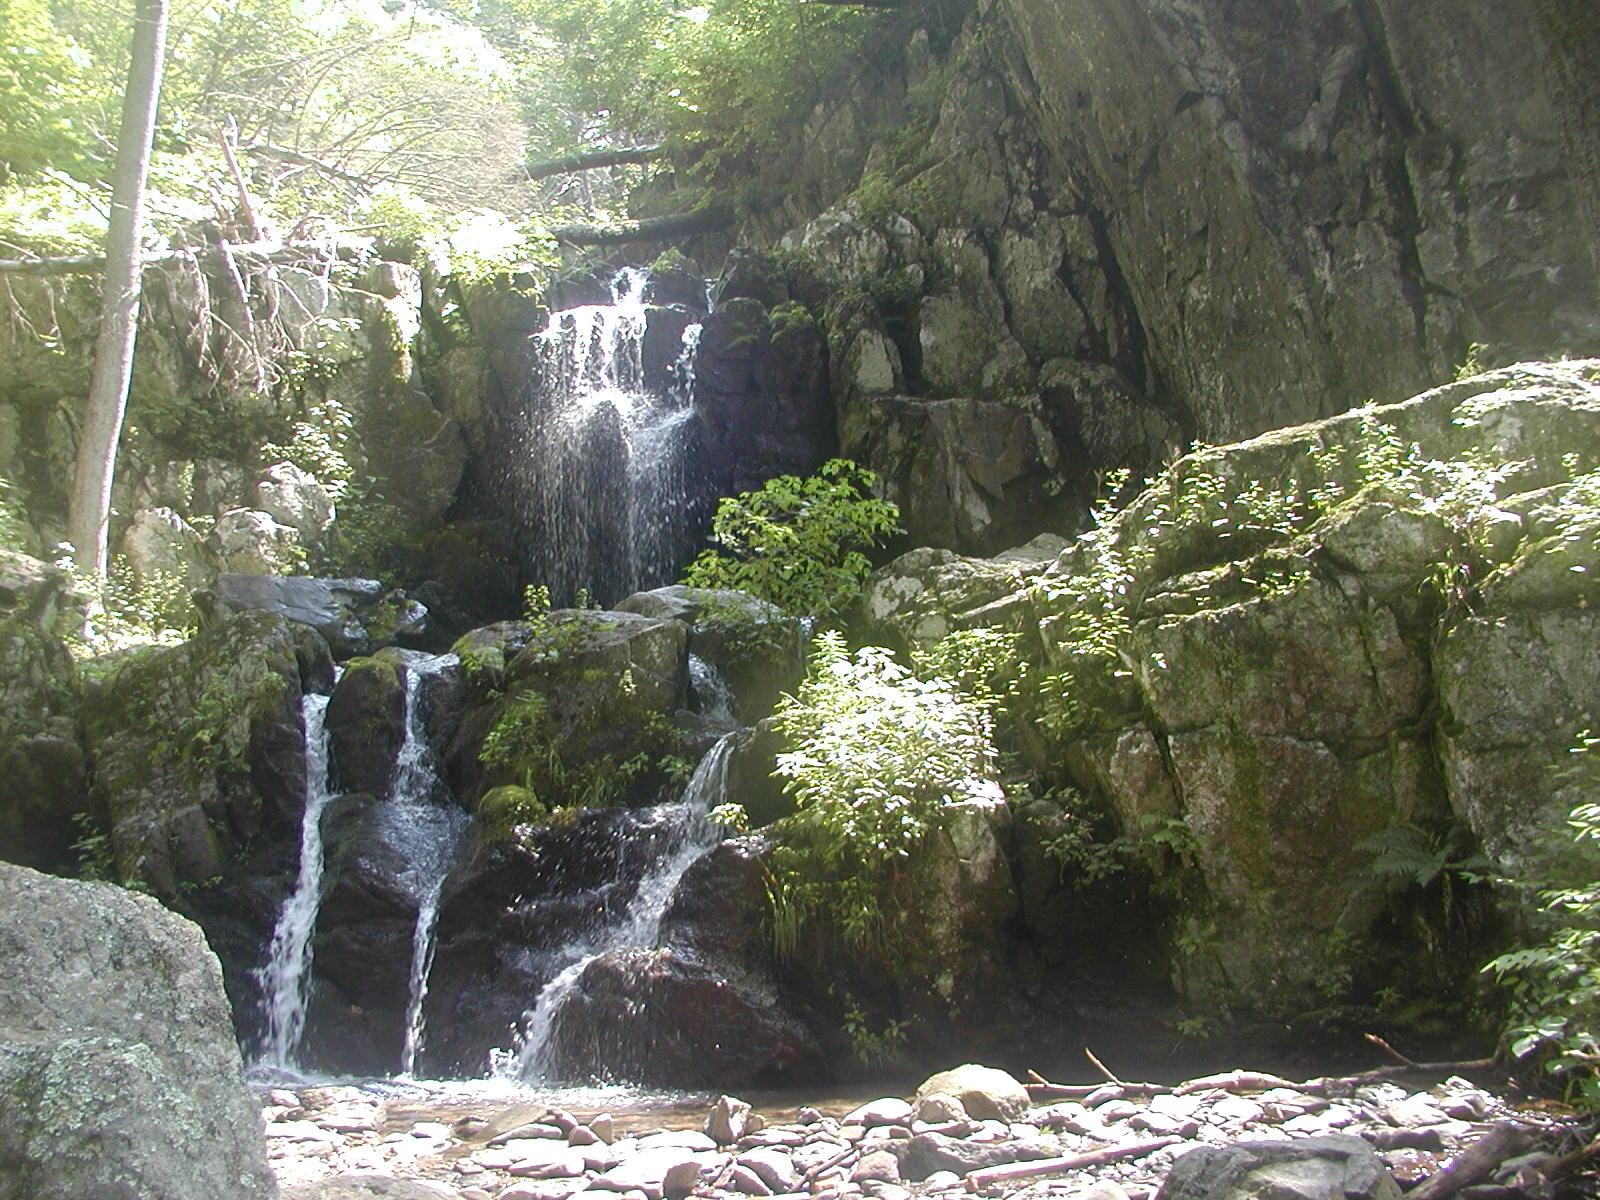 Blue Ridge Mountain Home: Waterfalls of Virginia